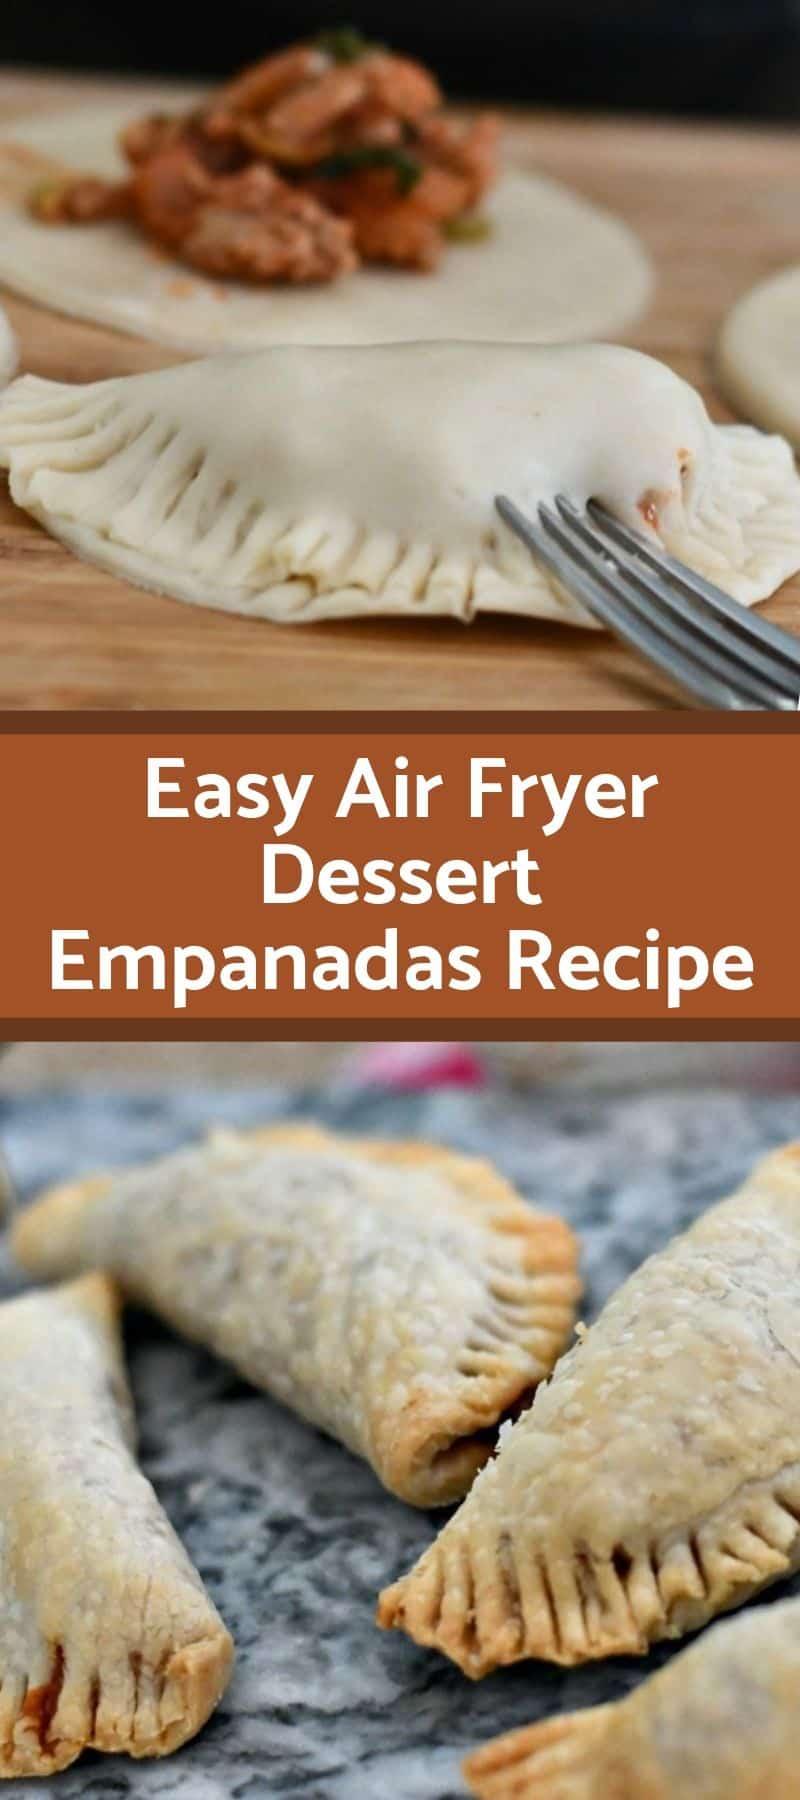 Easy Air Fryer Dessert Empanadas Recipe 3